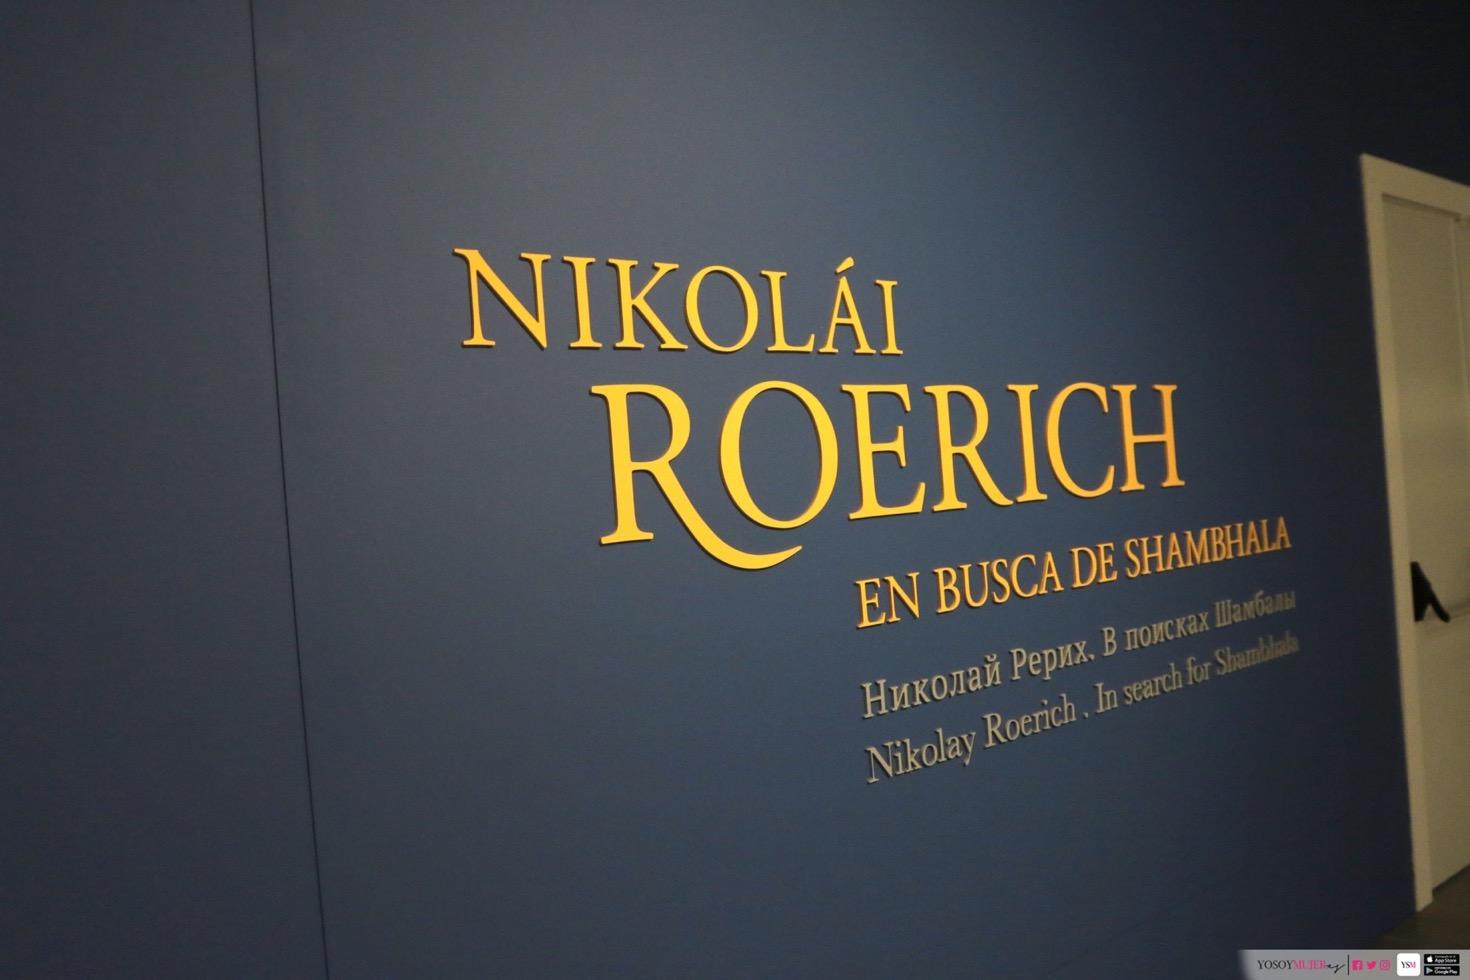 Nikolái Roerich